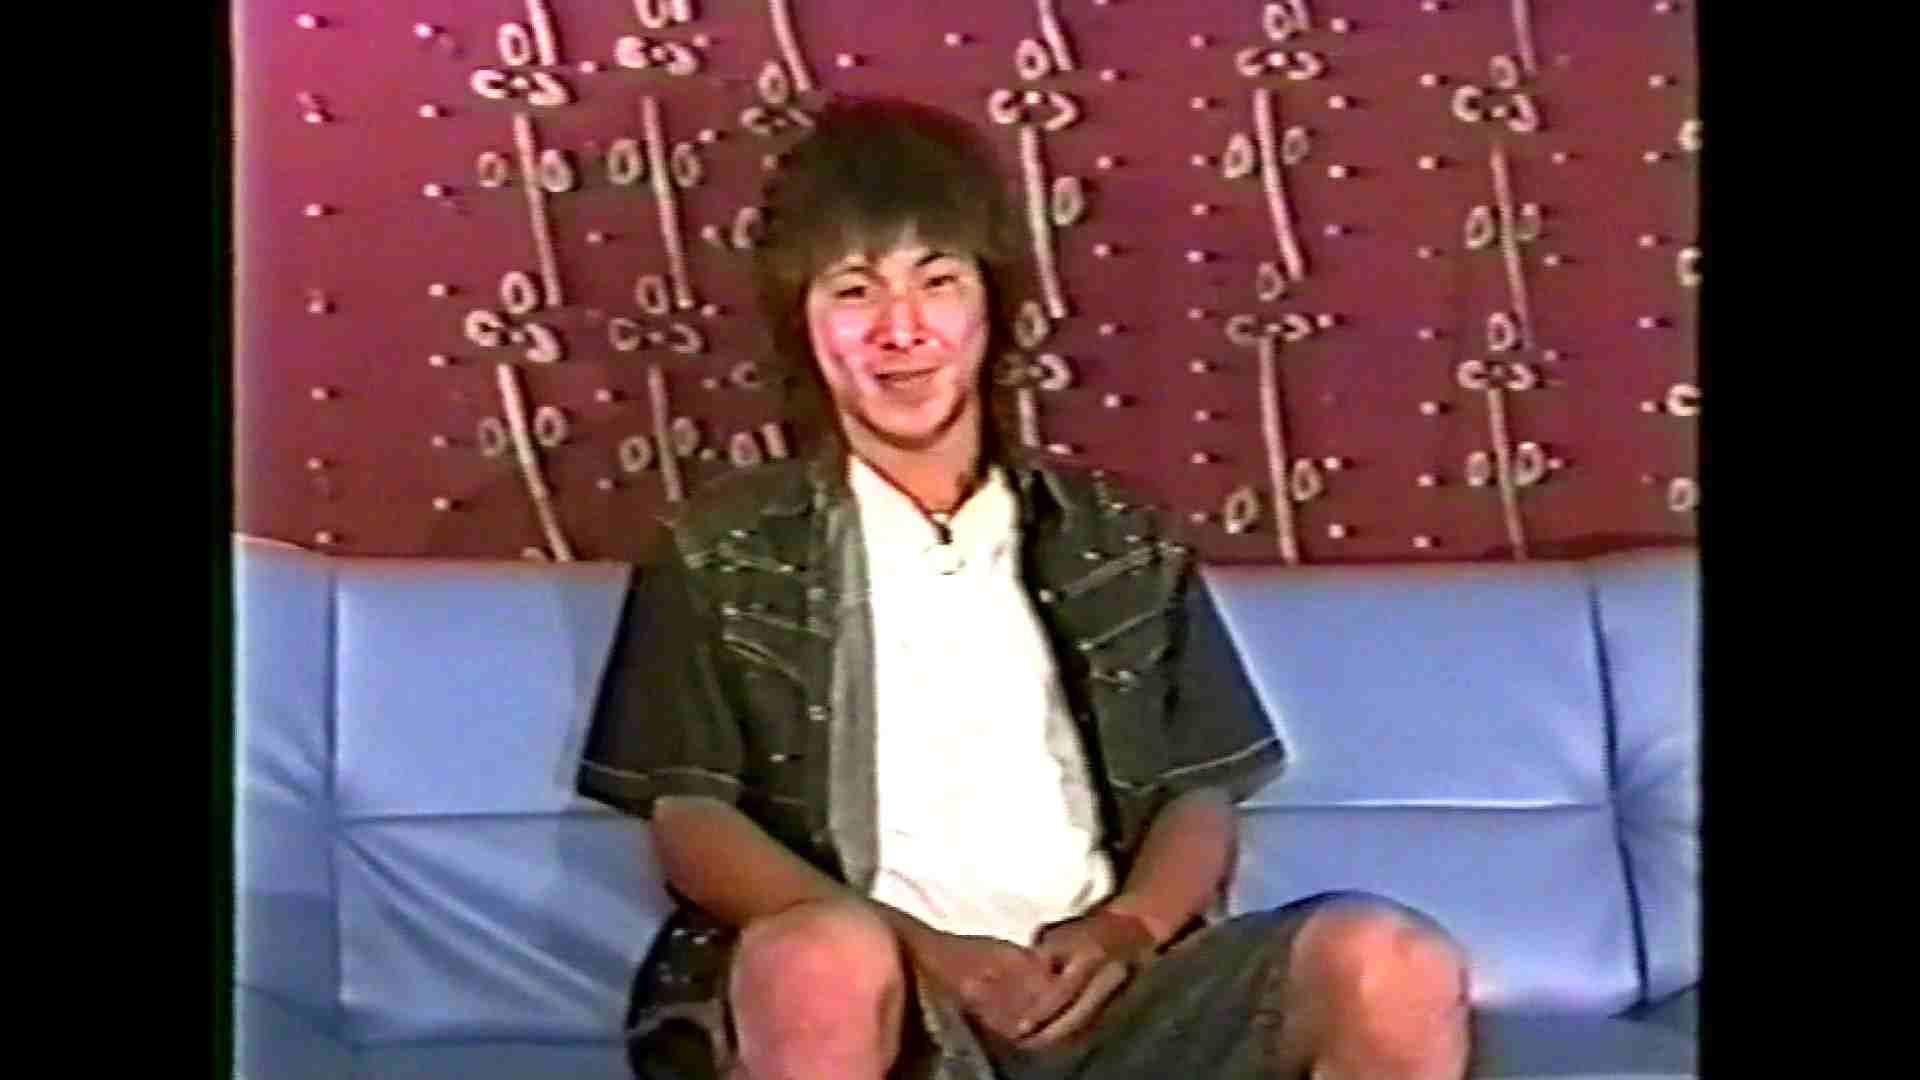 GAYBOY宏のオカズ倉庫Vol.3-1 GAY ゲイセックス画像 103画像 31